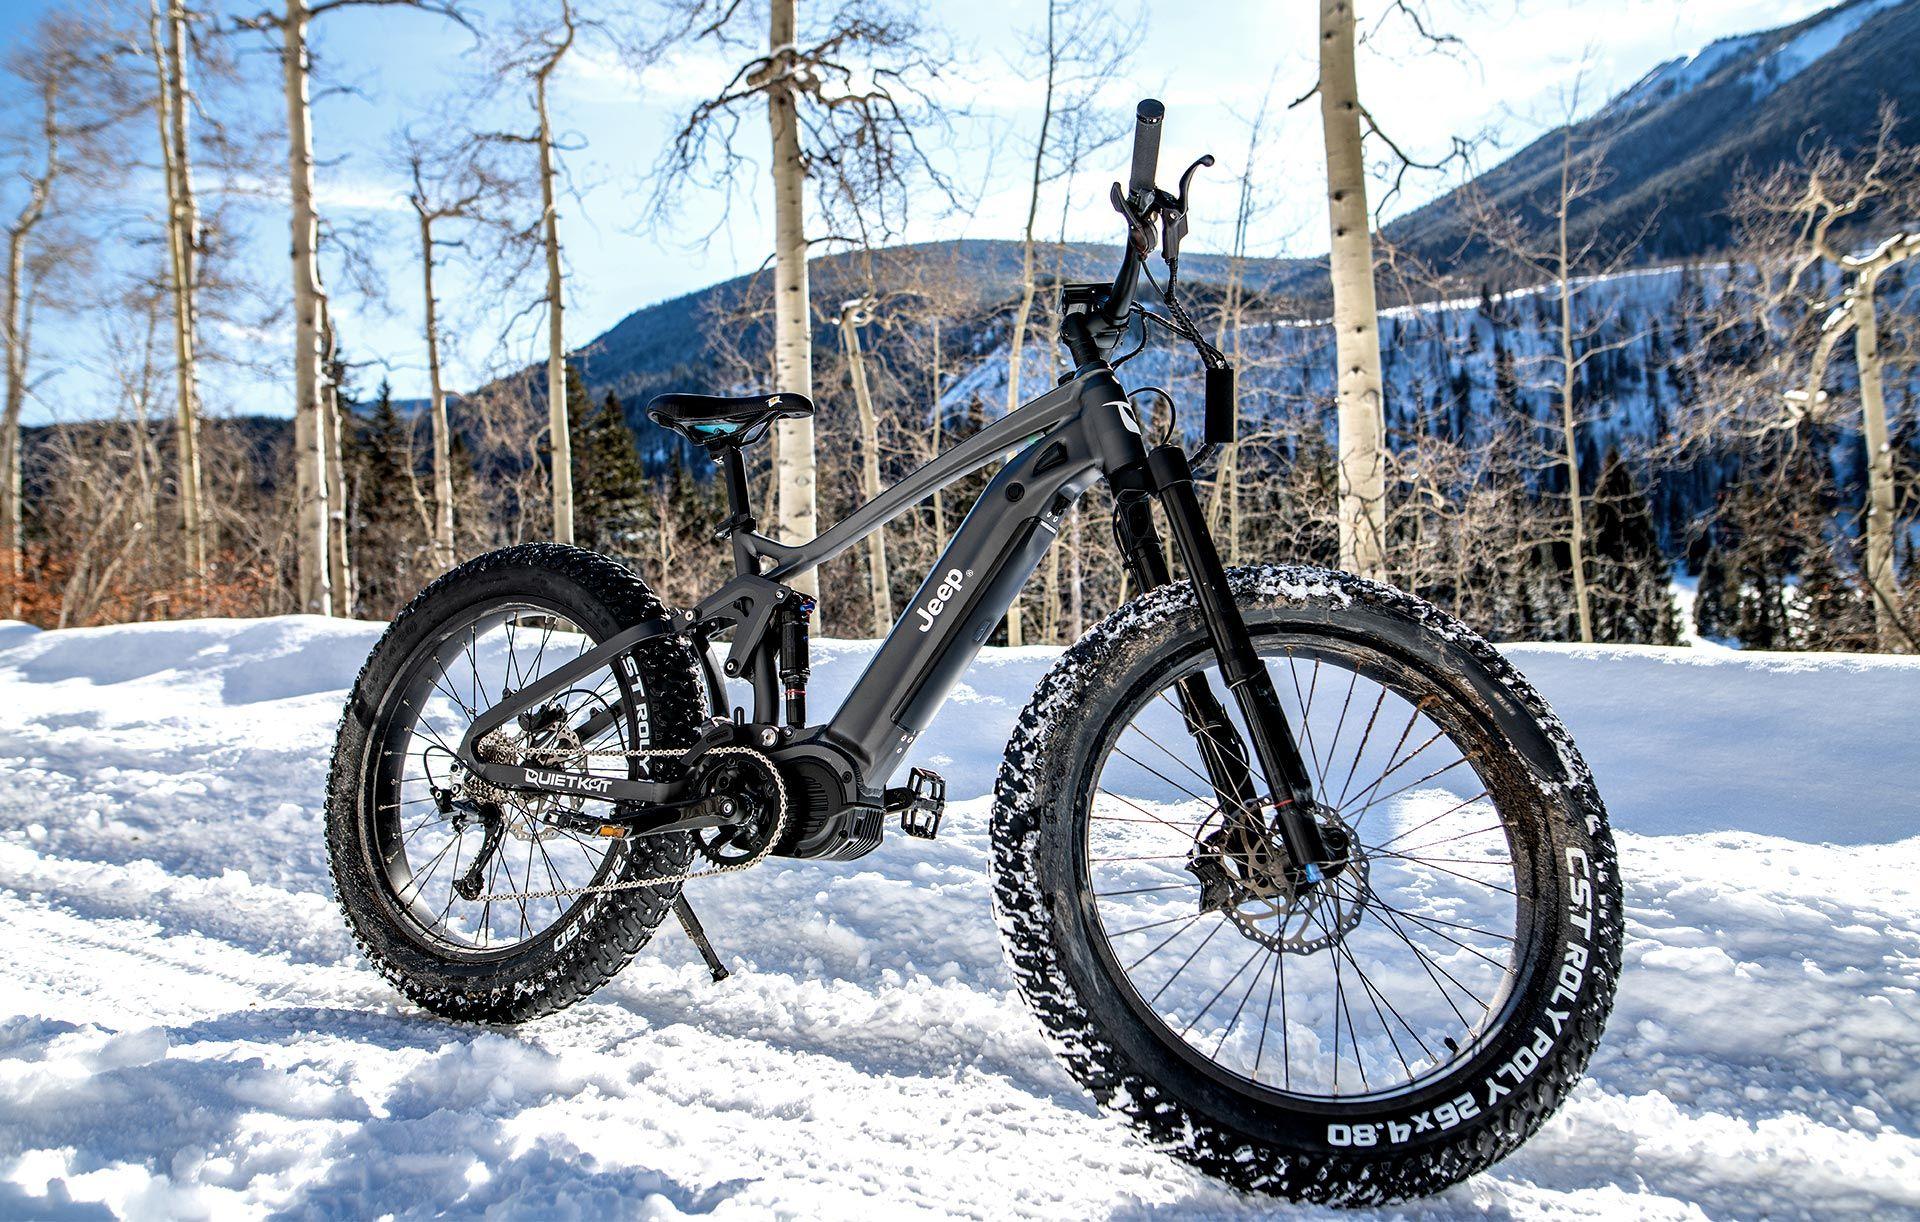 Jeep visar upp eldriven mountainbike